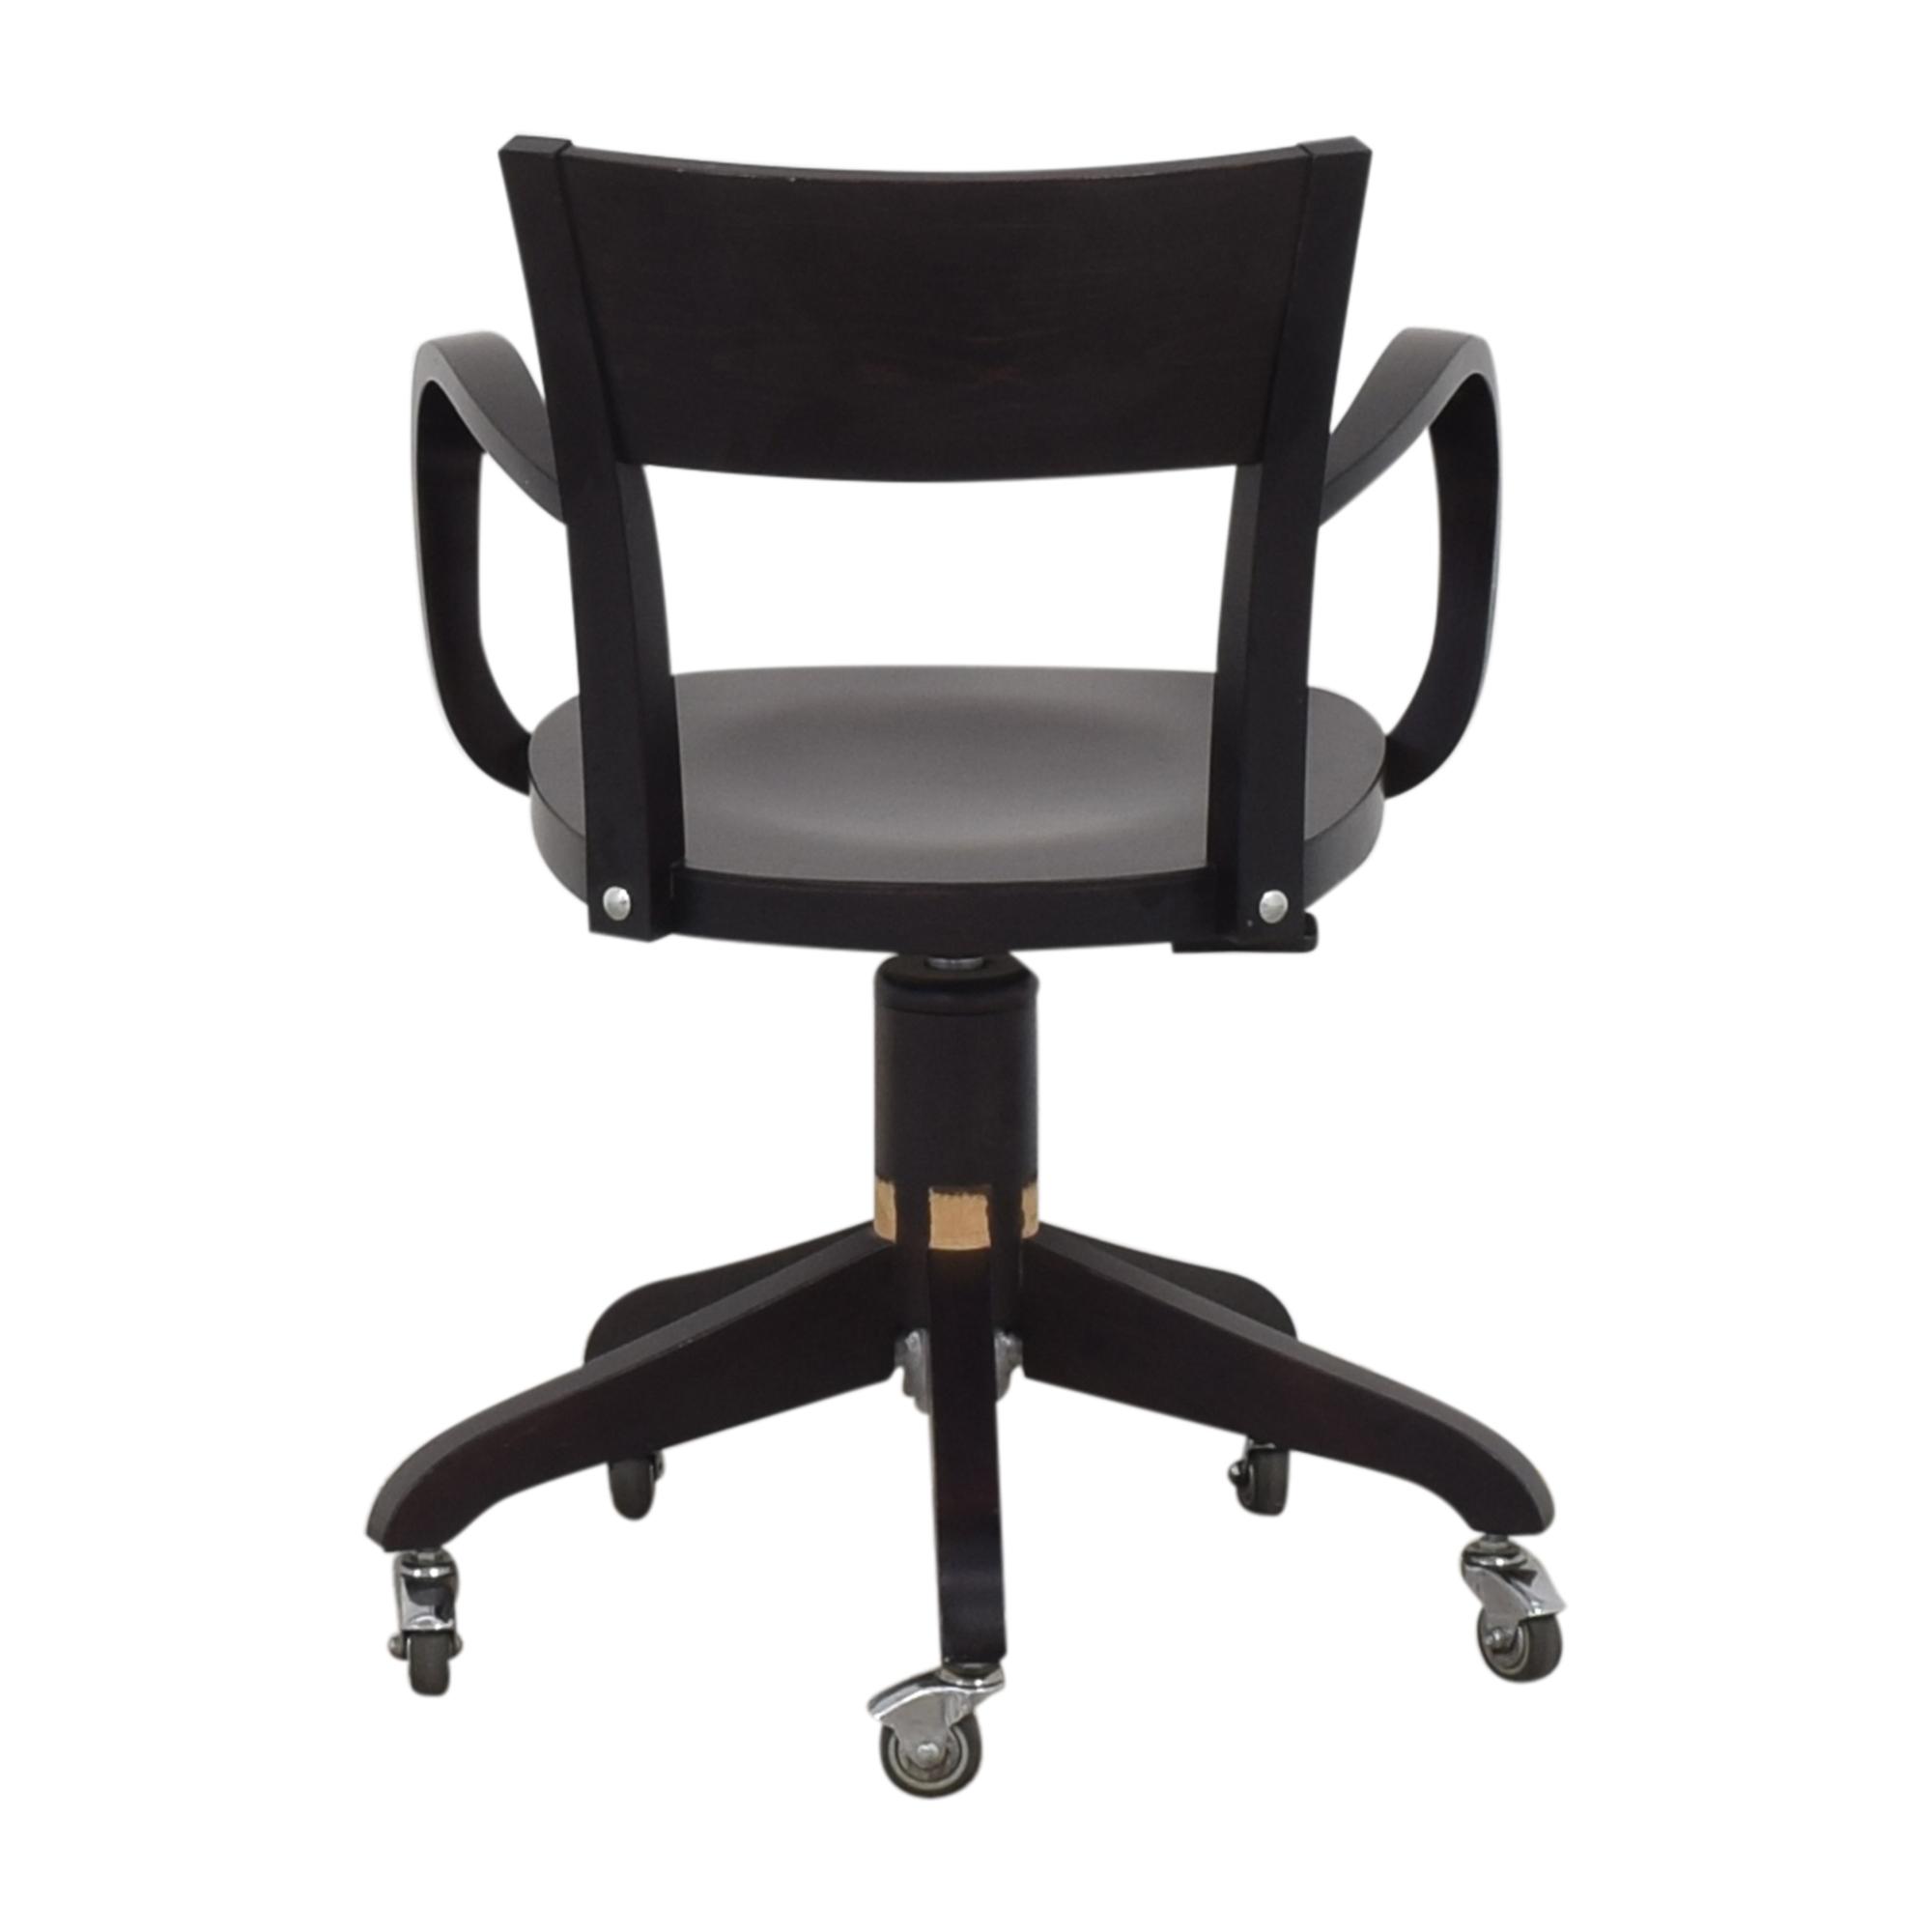 Crate & Barrel Crate & Barrel Swivel Desk Chair pa